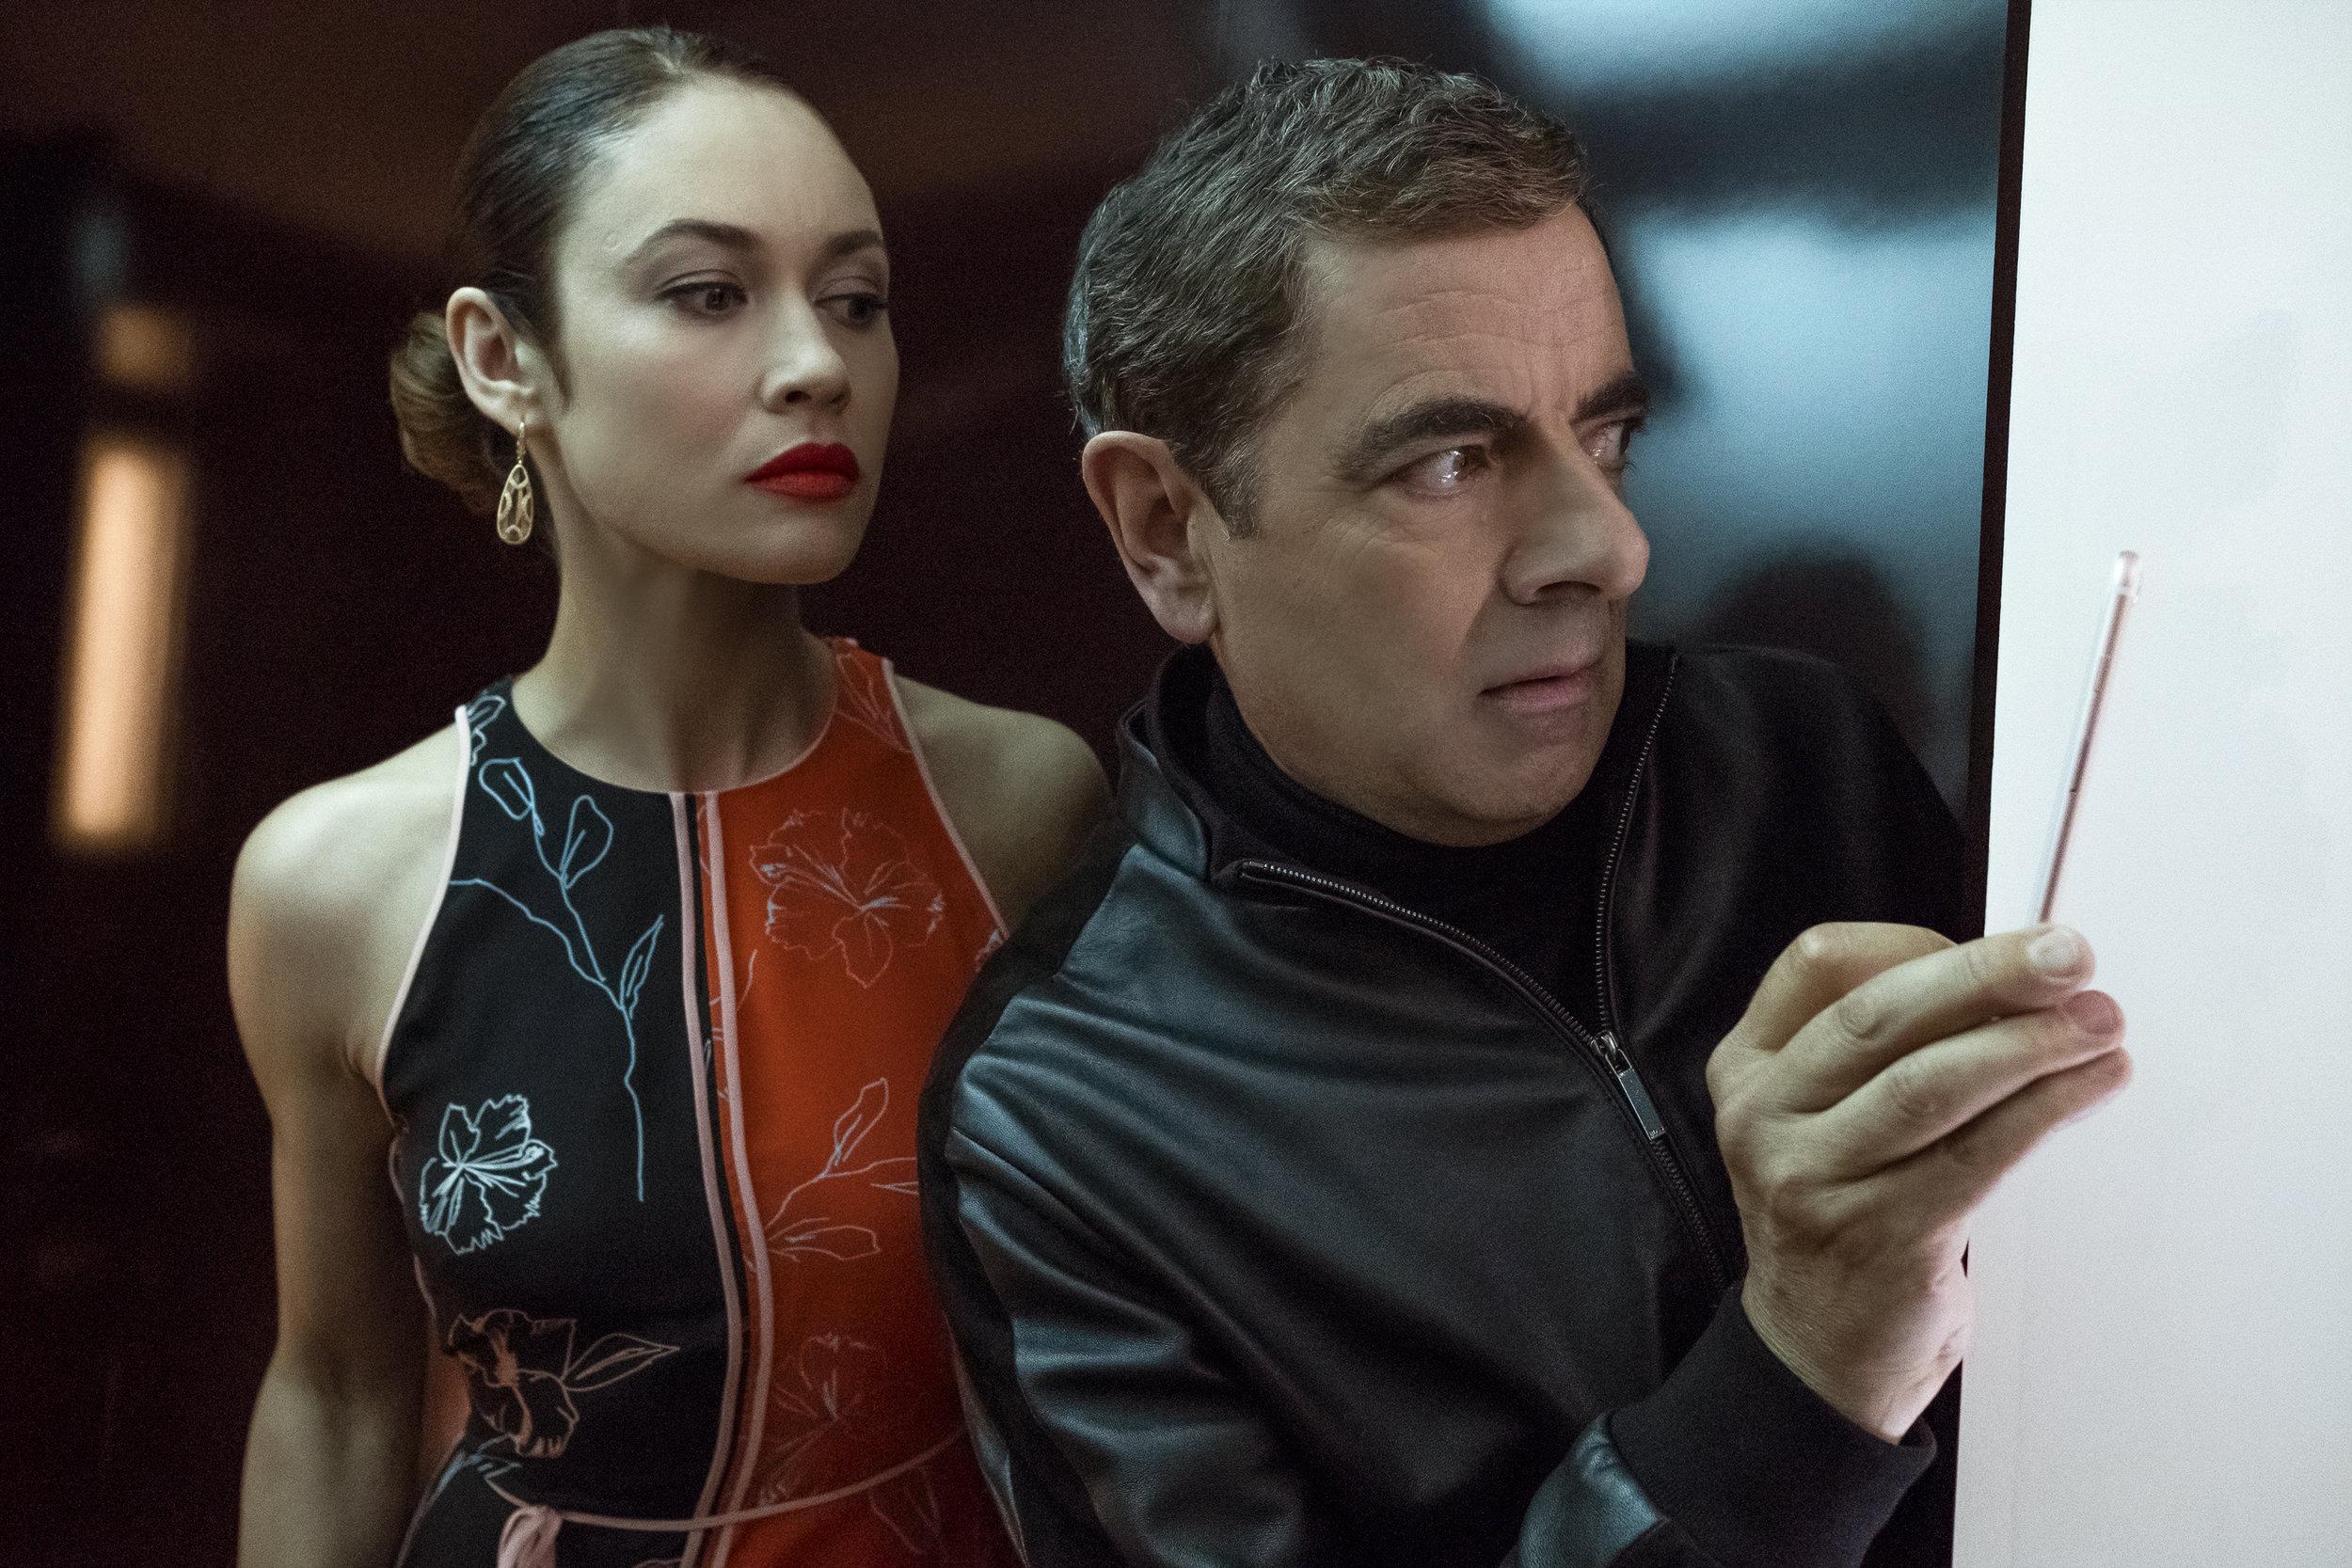 Kurylenko and Atkinson: A real Bond girl wonders what she's doing with a fake Bond.